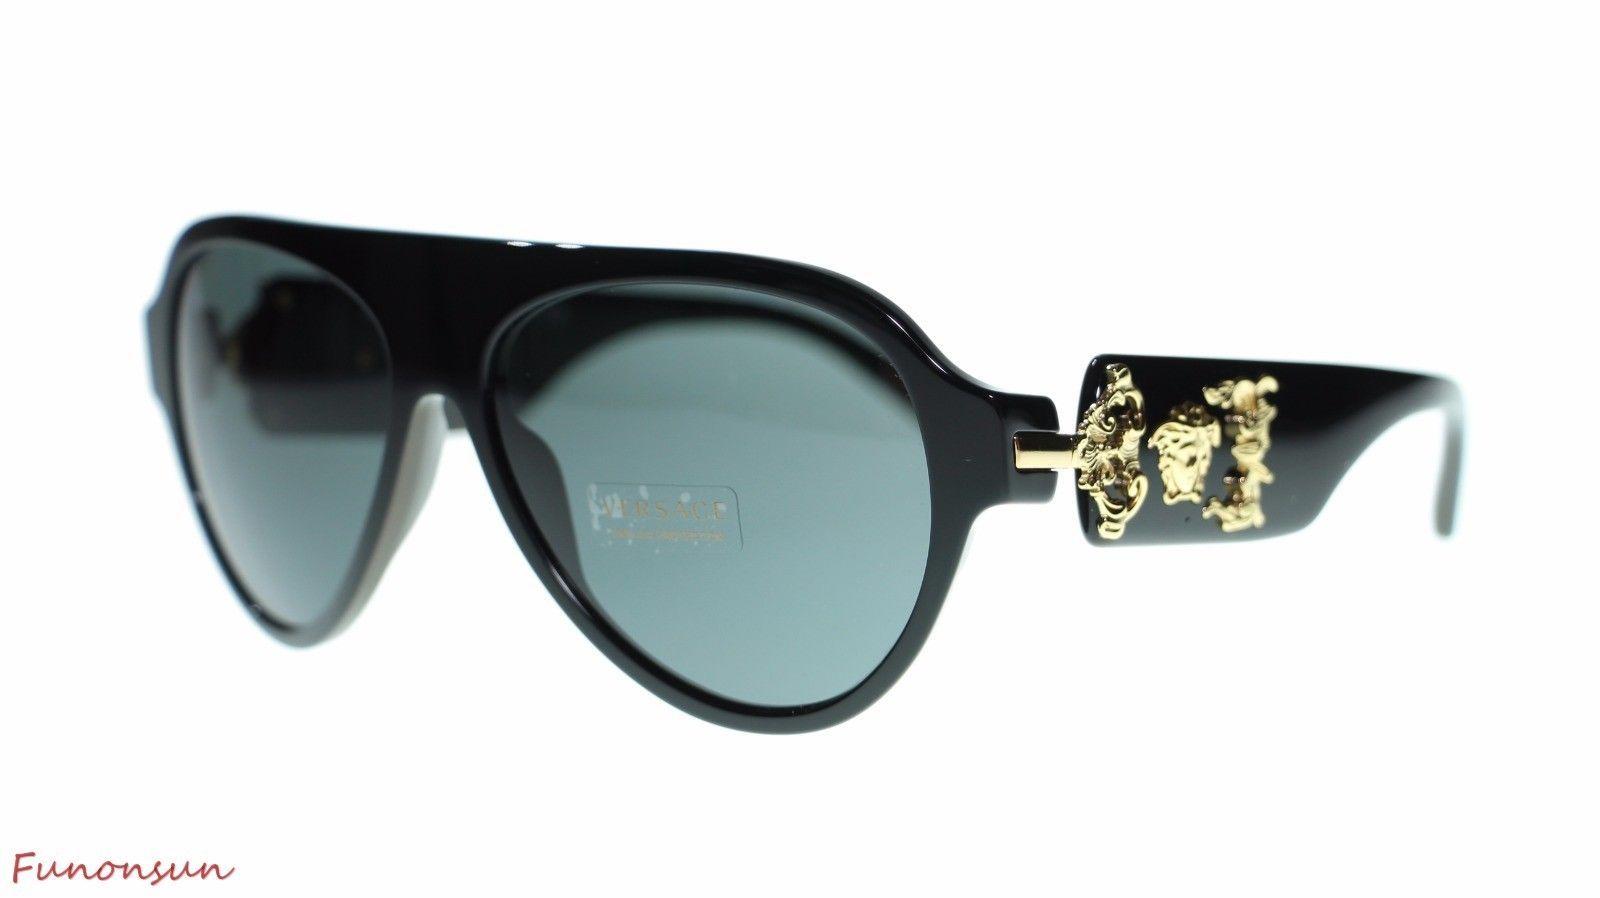 07b4a431950 Versace Men s Pilot Sunglasses VE4323 GB1 87 and 23 similar items. S l1600